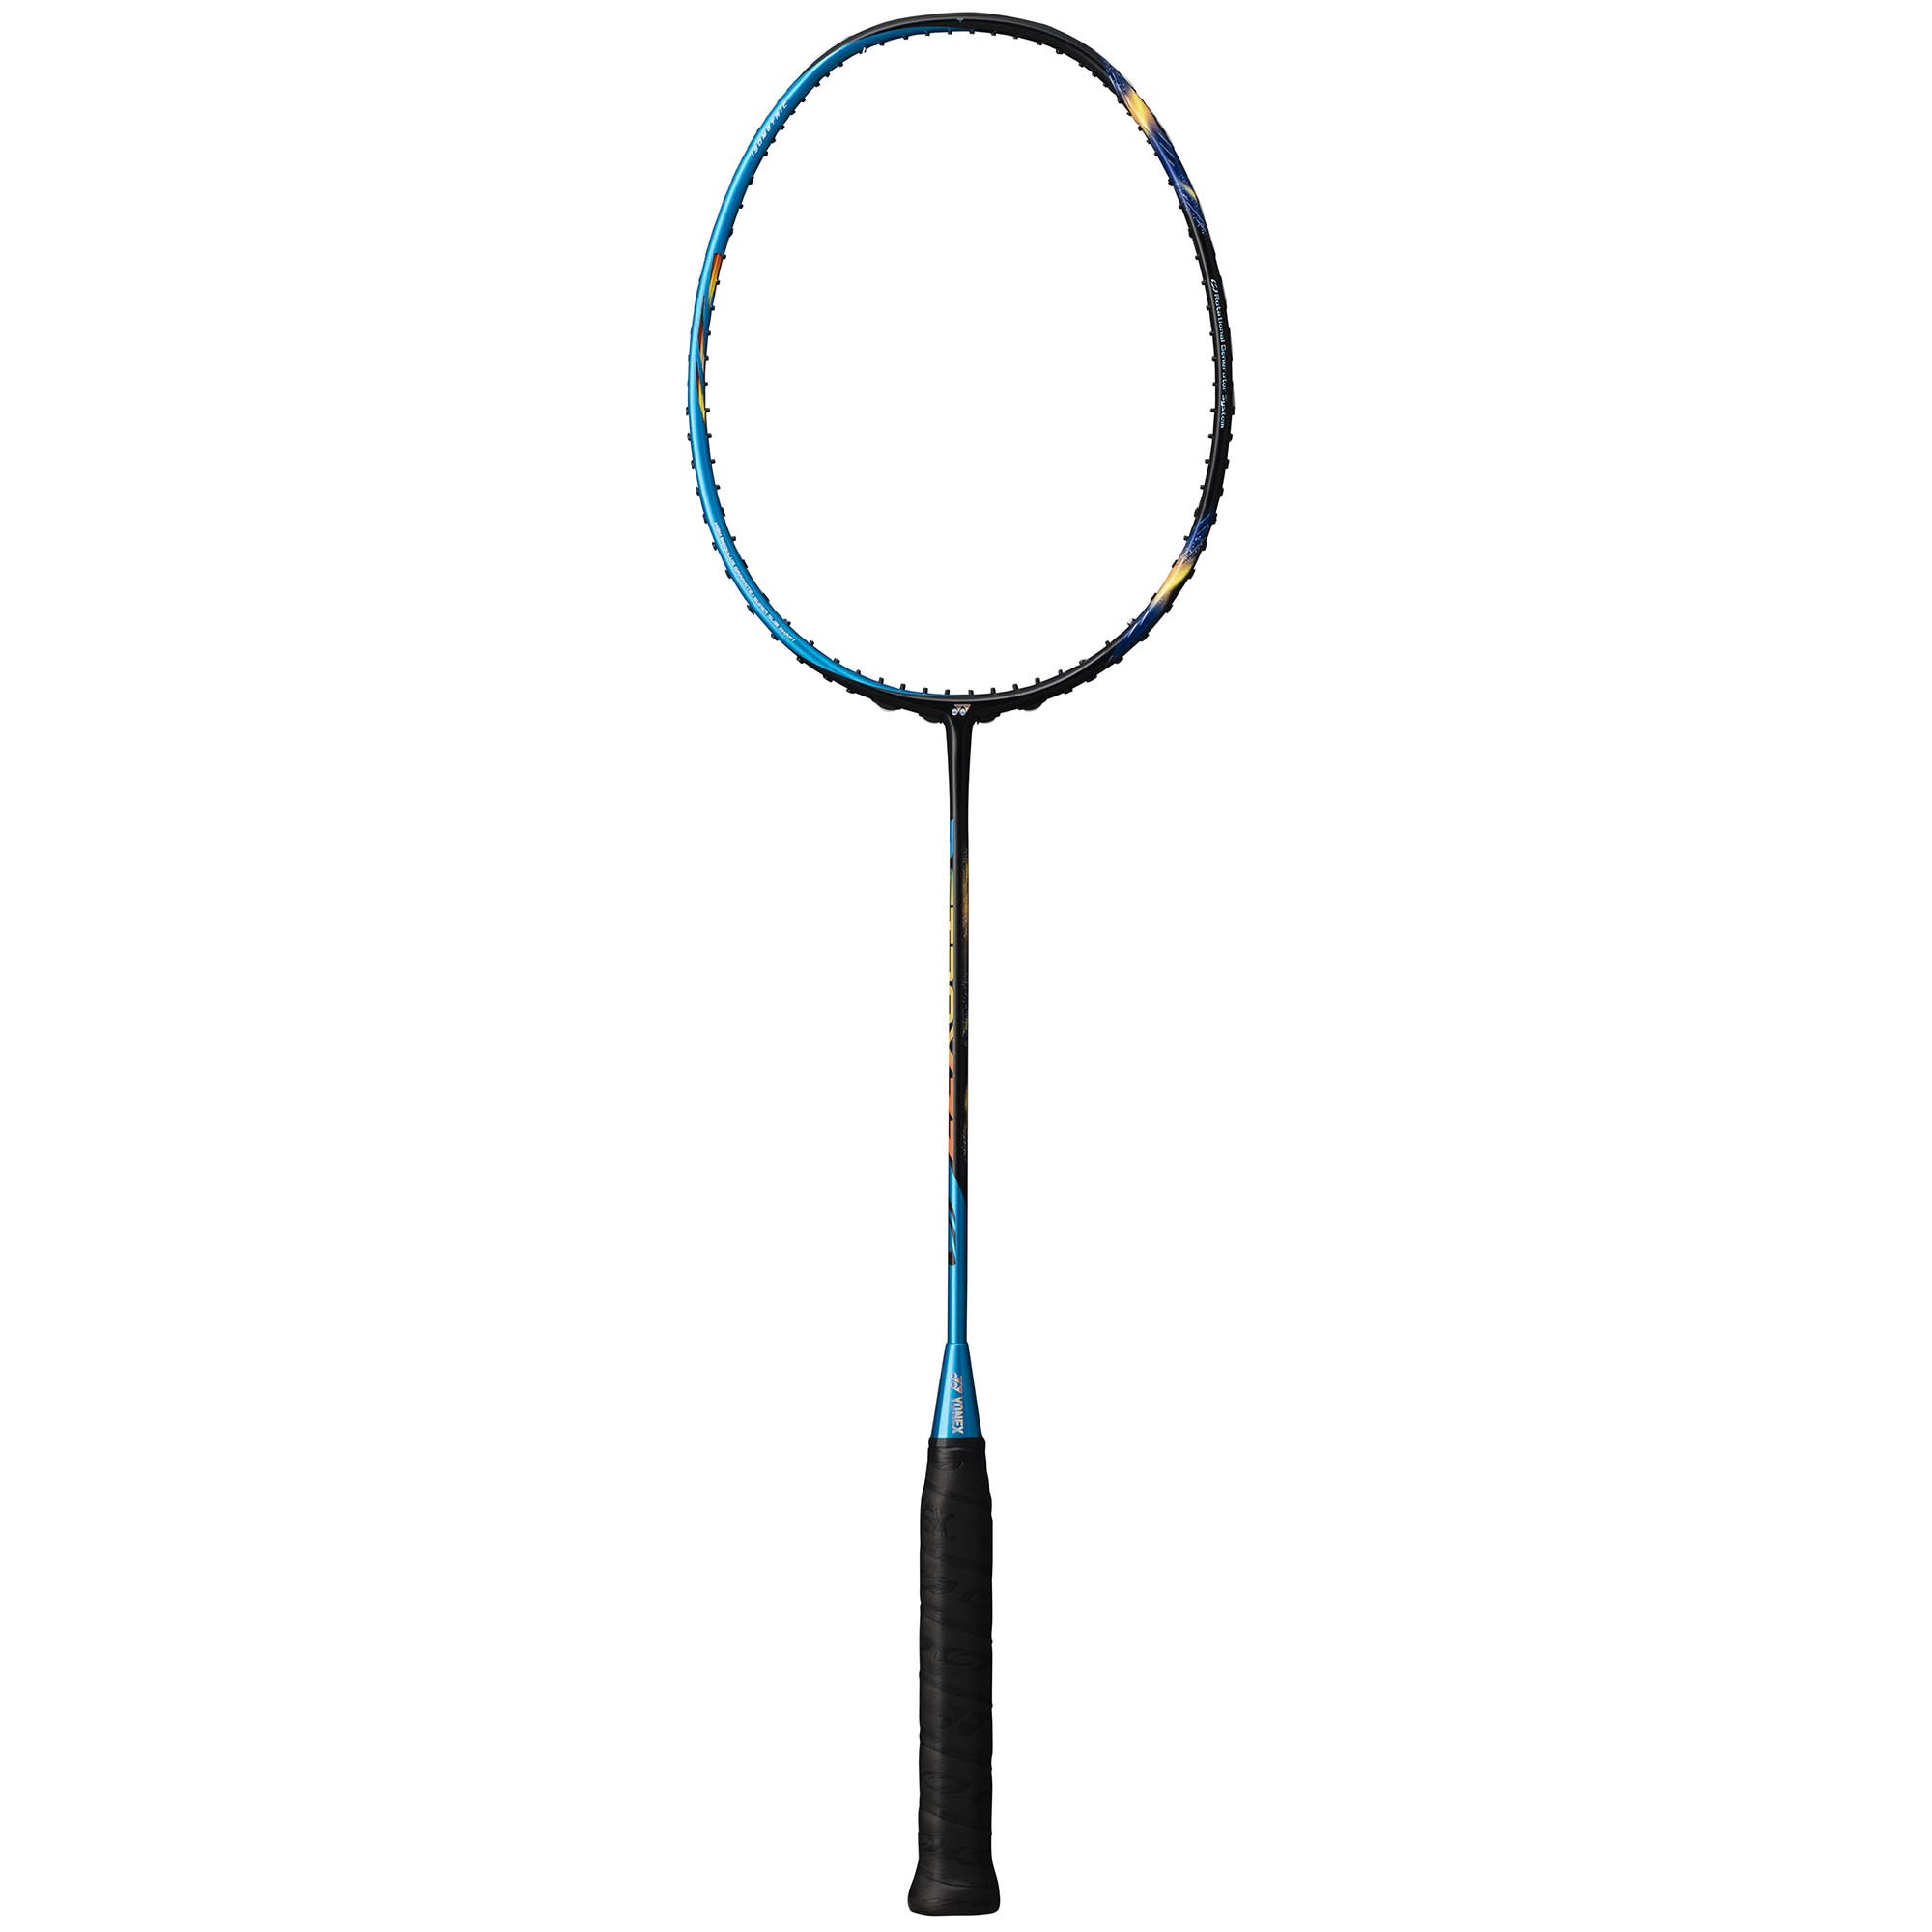 Yonex Astrox 77 3U Badminton Racket